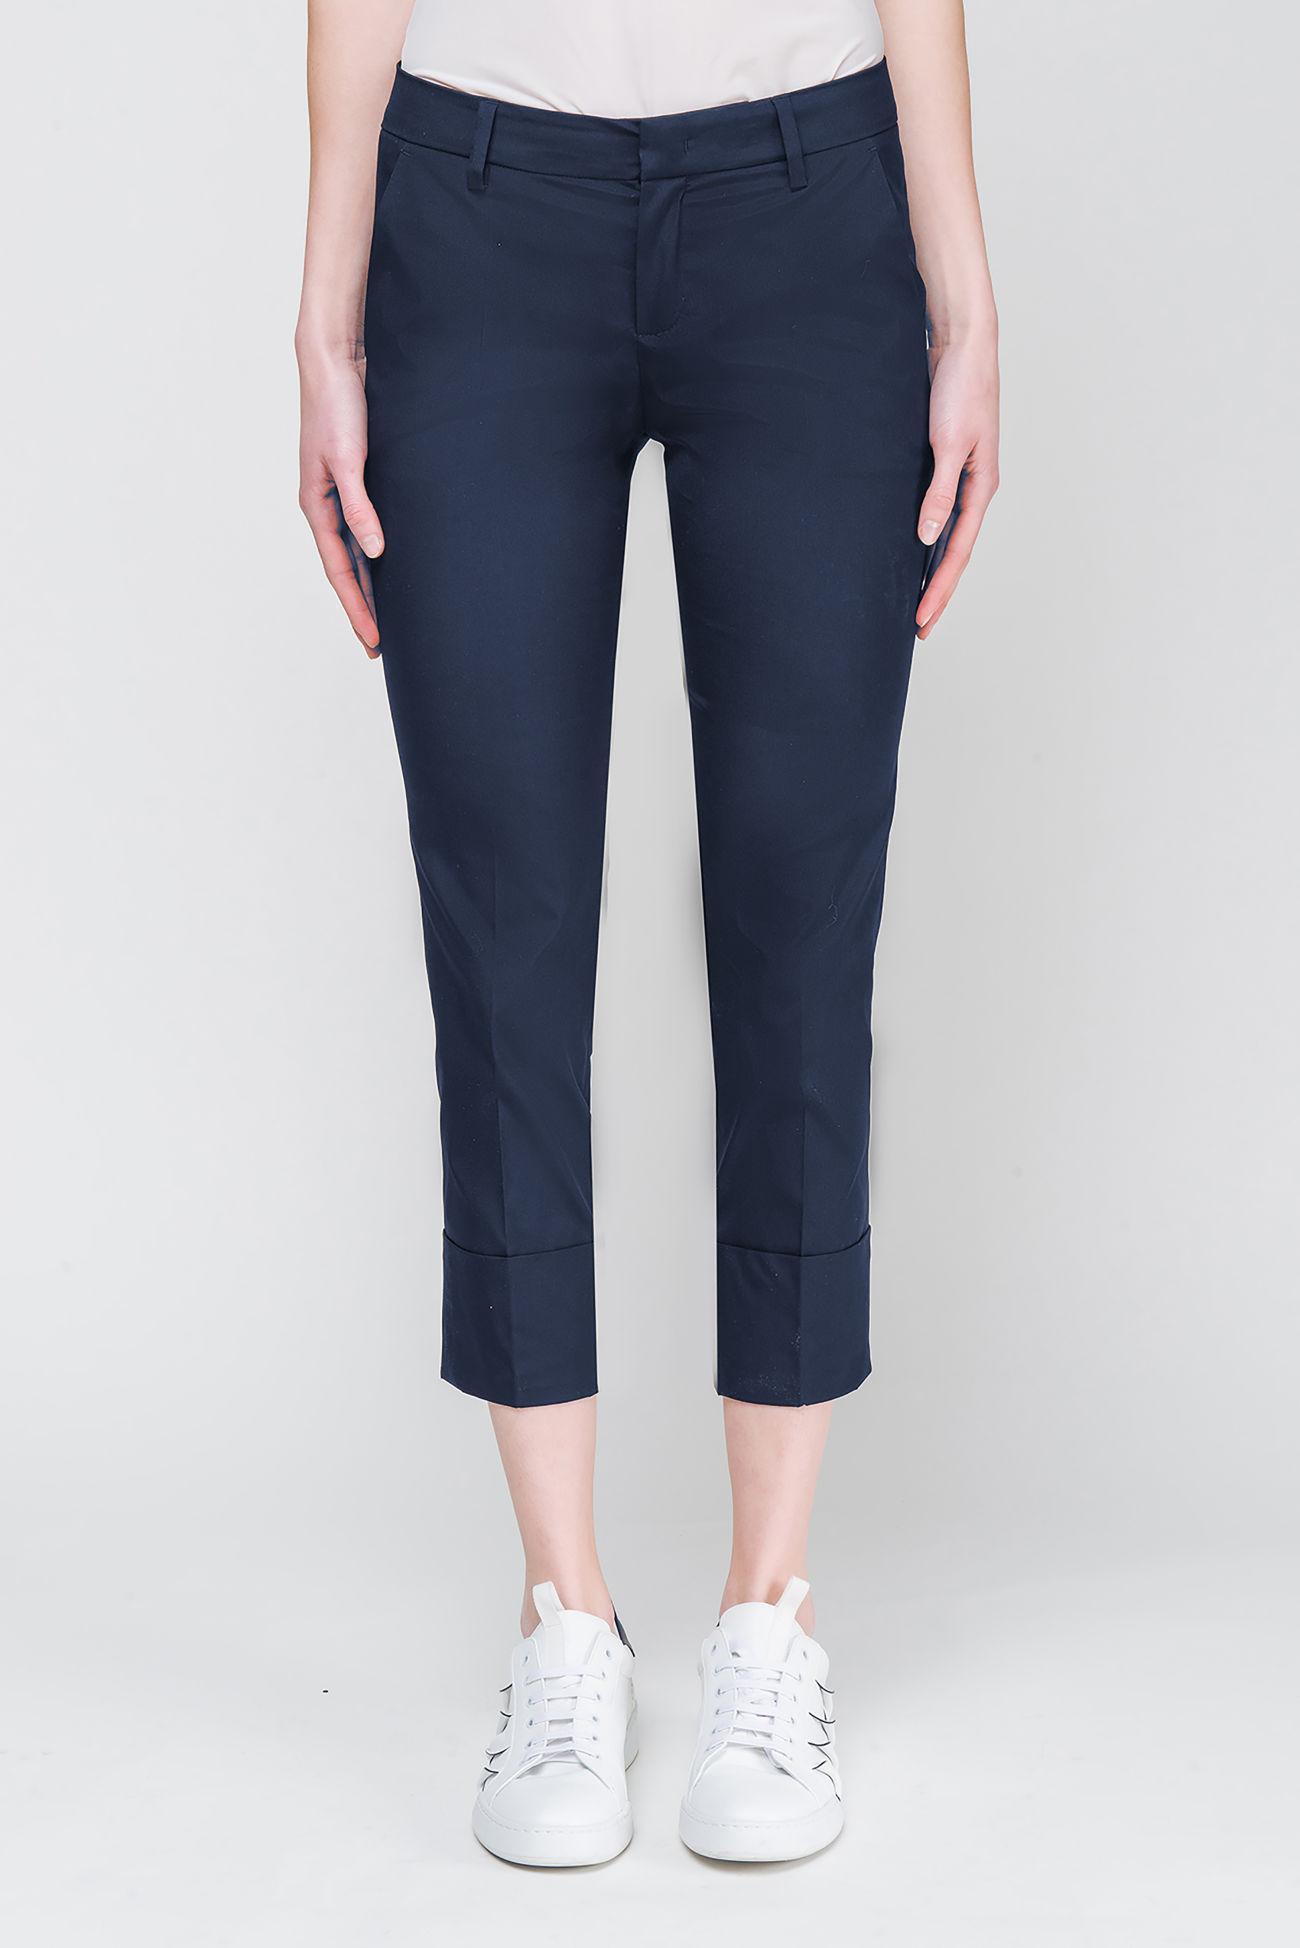 Pants in poplin-stretch